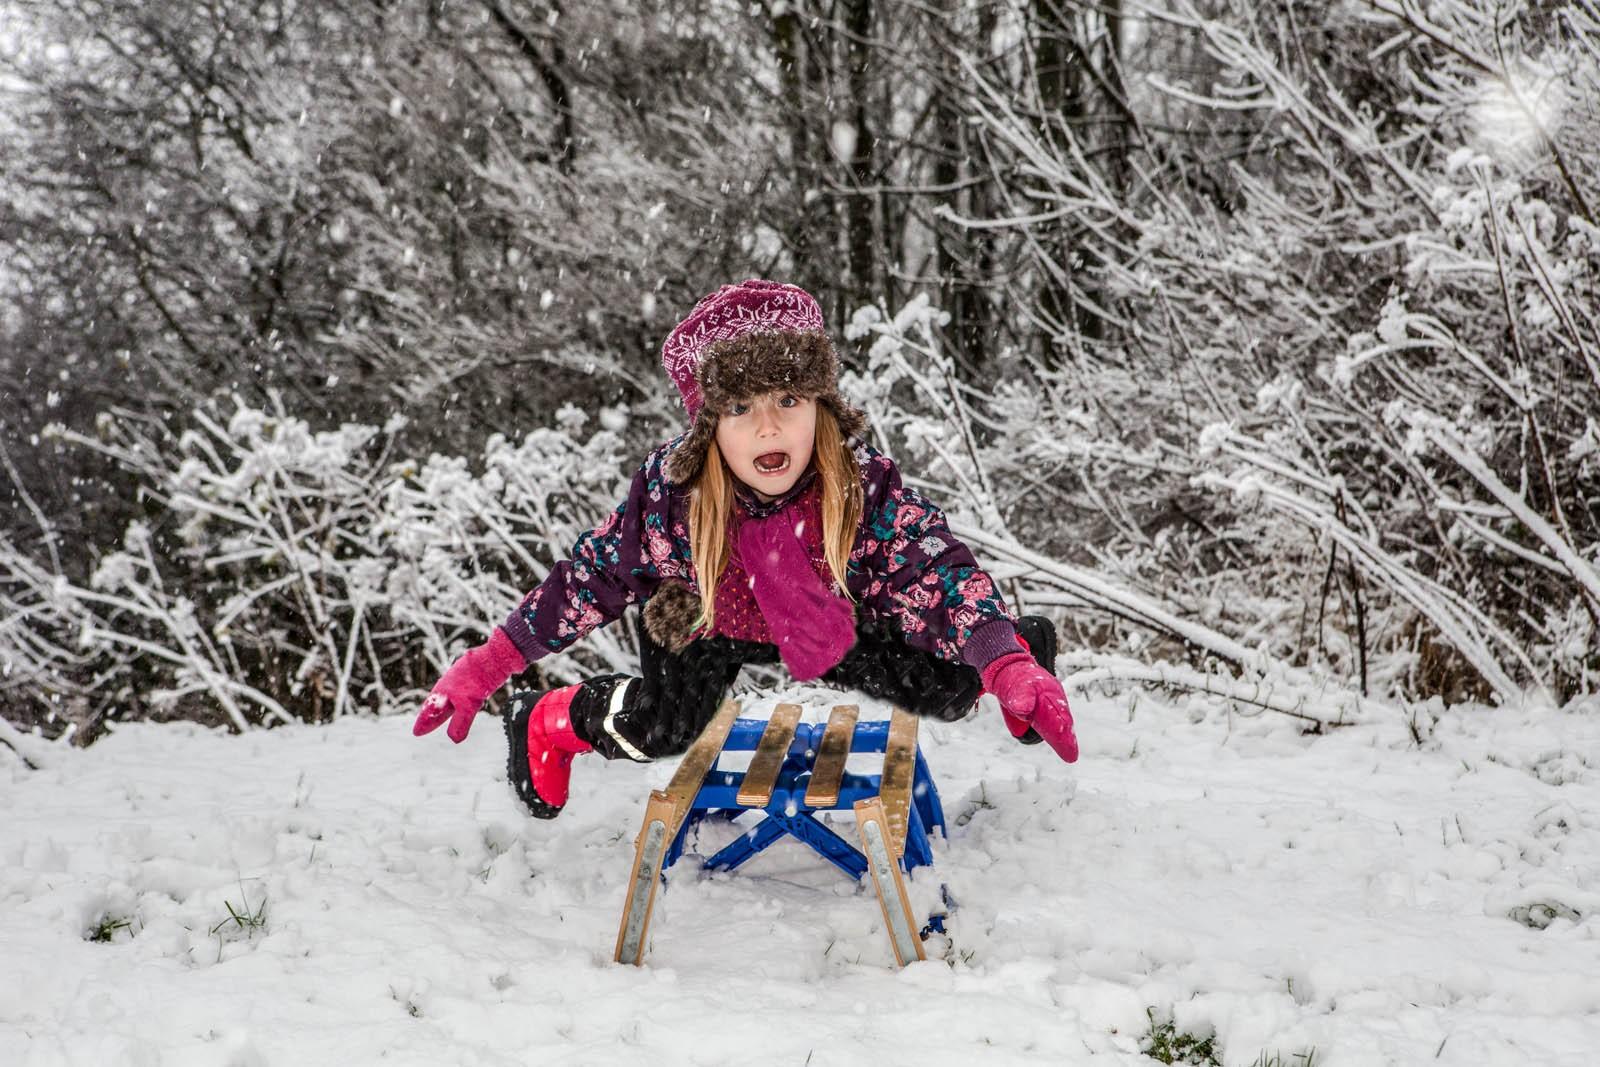 Snowfun trick photo